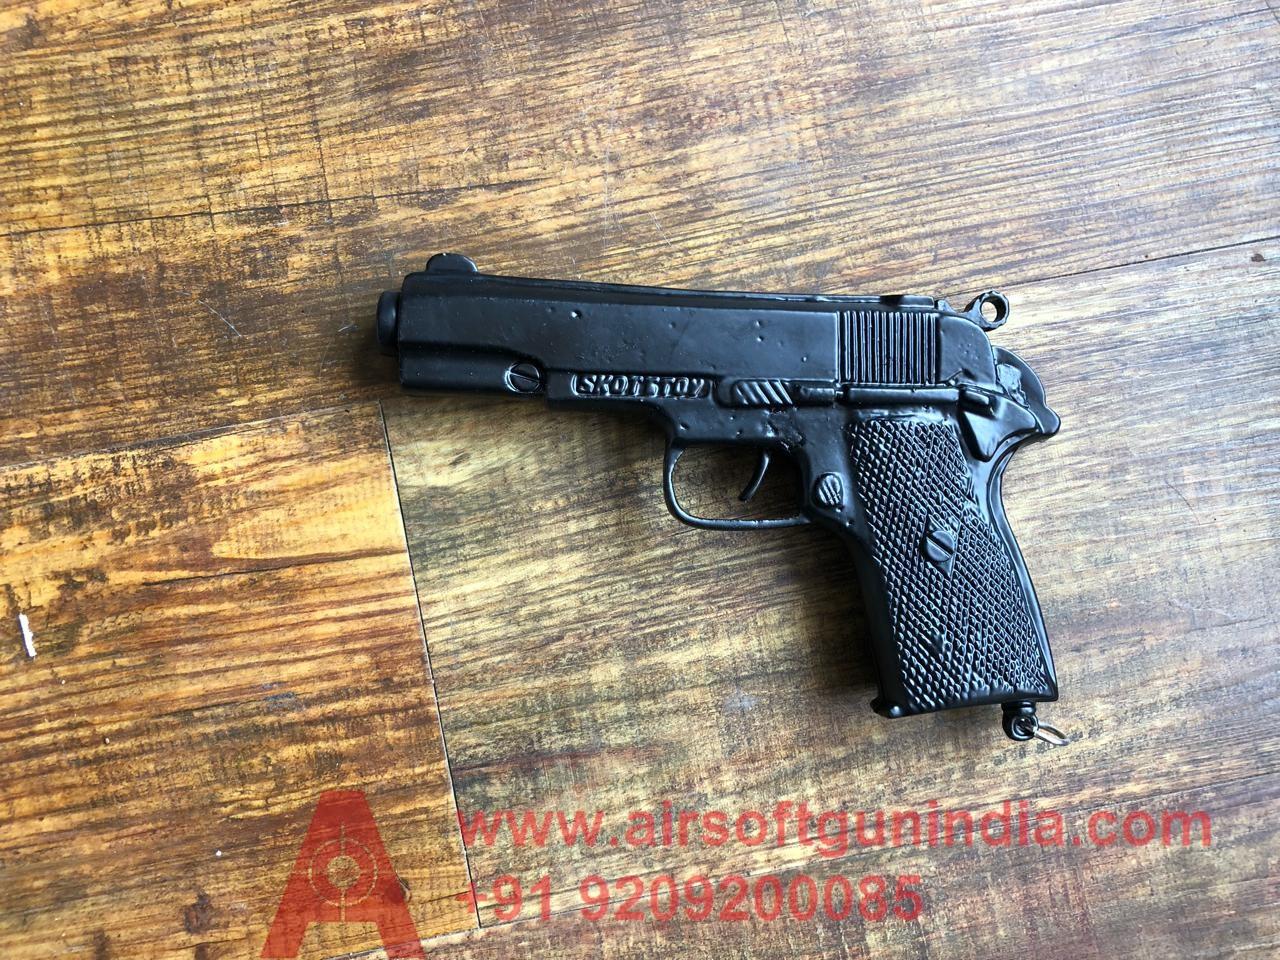 CORK GUN BERETTA STYLE BLACK  BY AIRSOFT GUN INDIA ( SOUND GUN ) FOR CROP PROTECTION